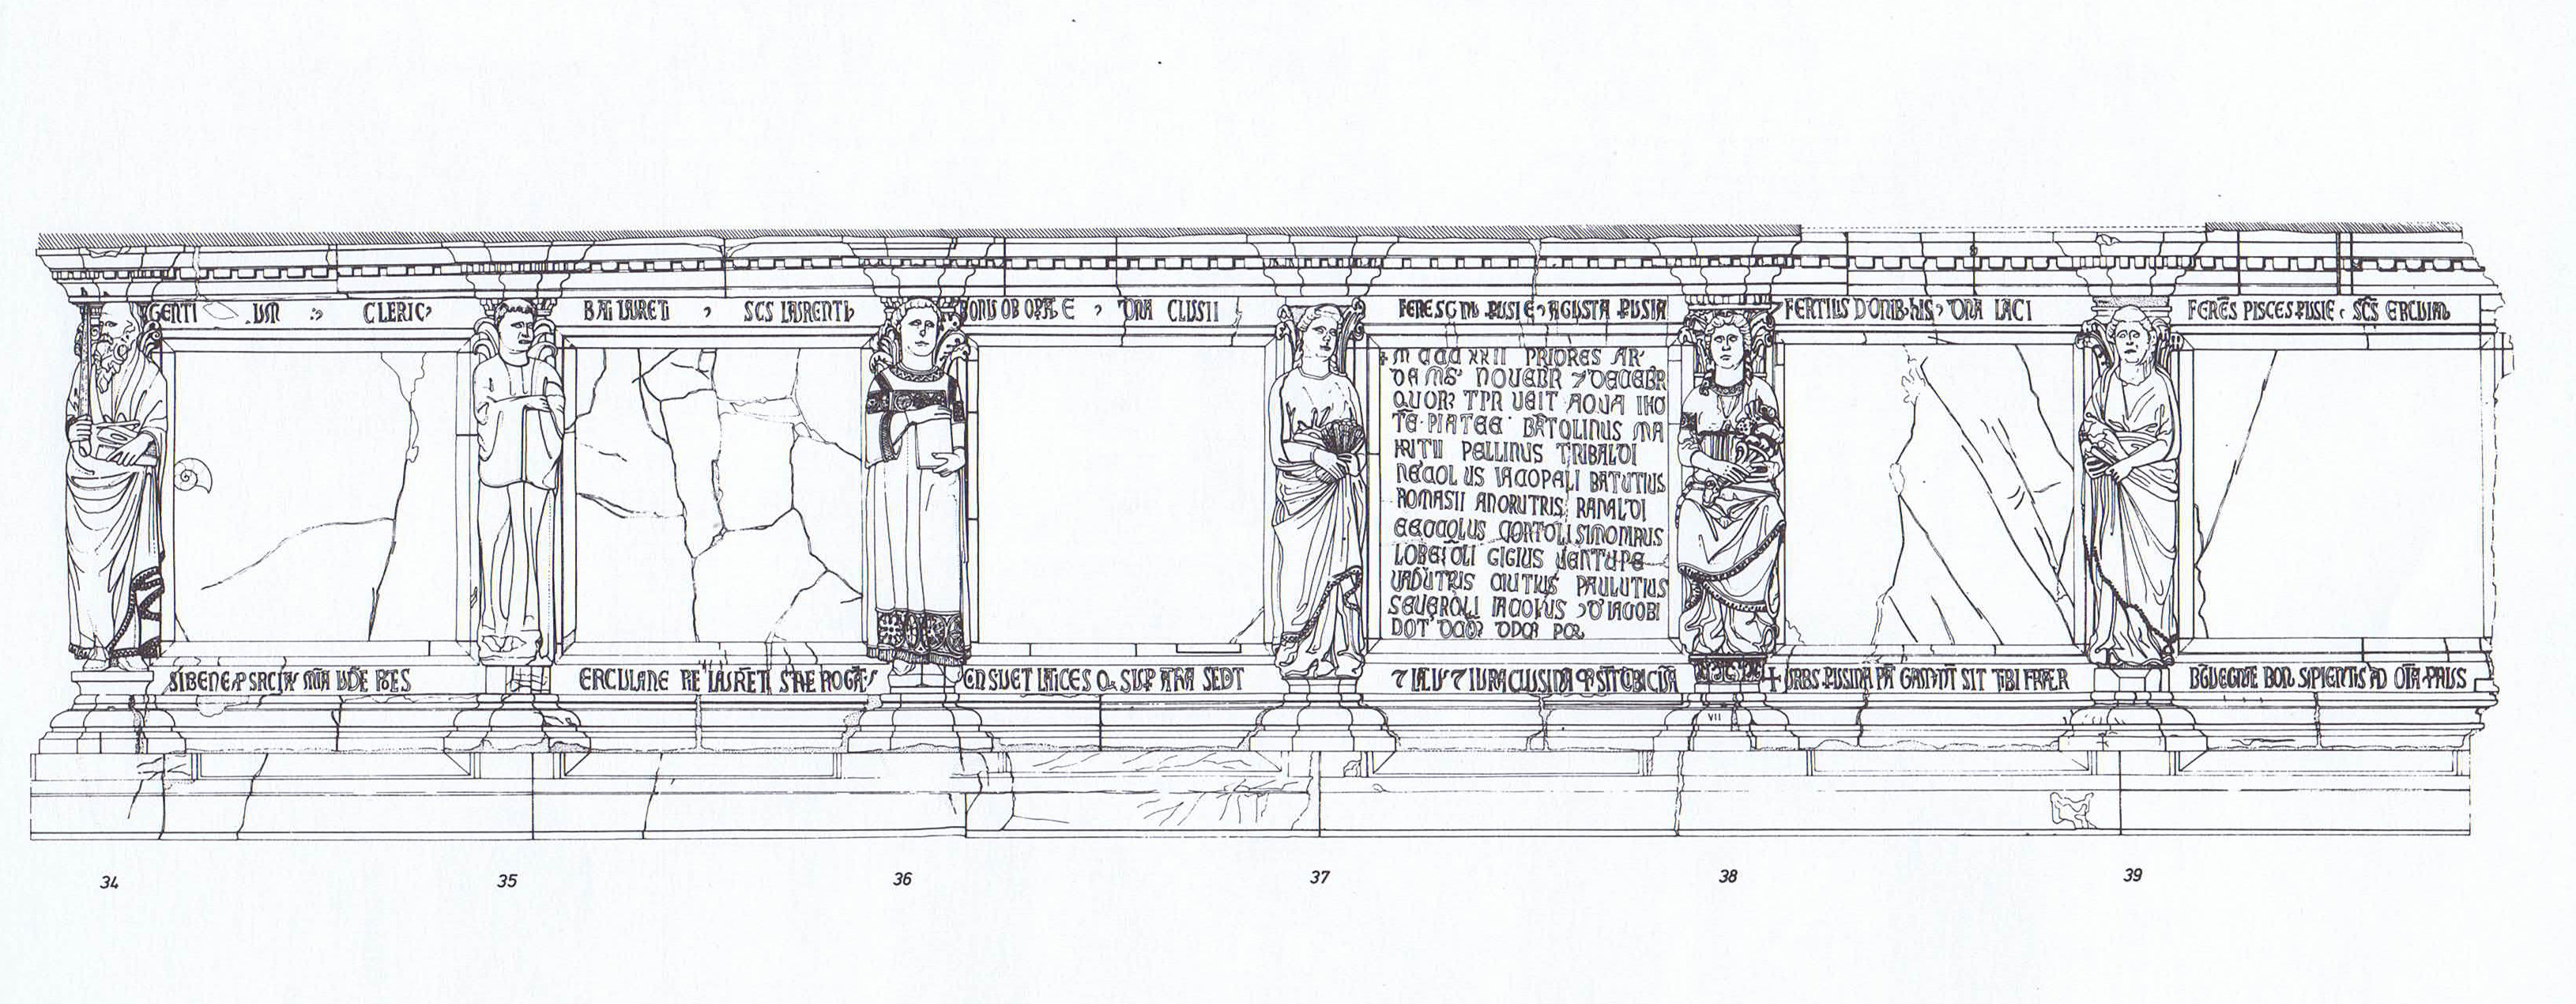 dettagli scala 1:5